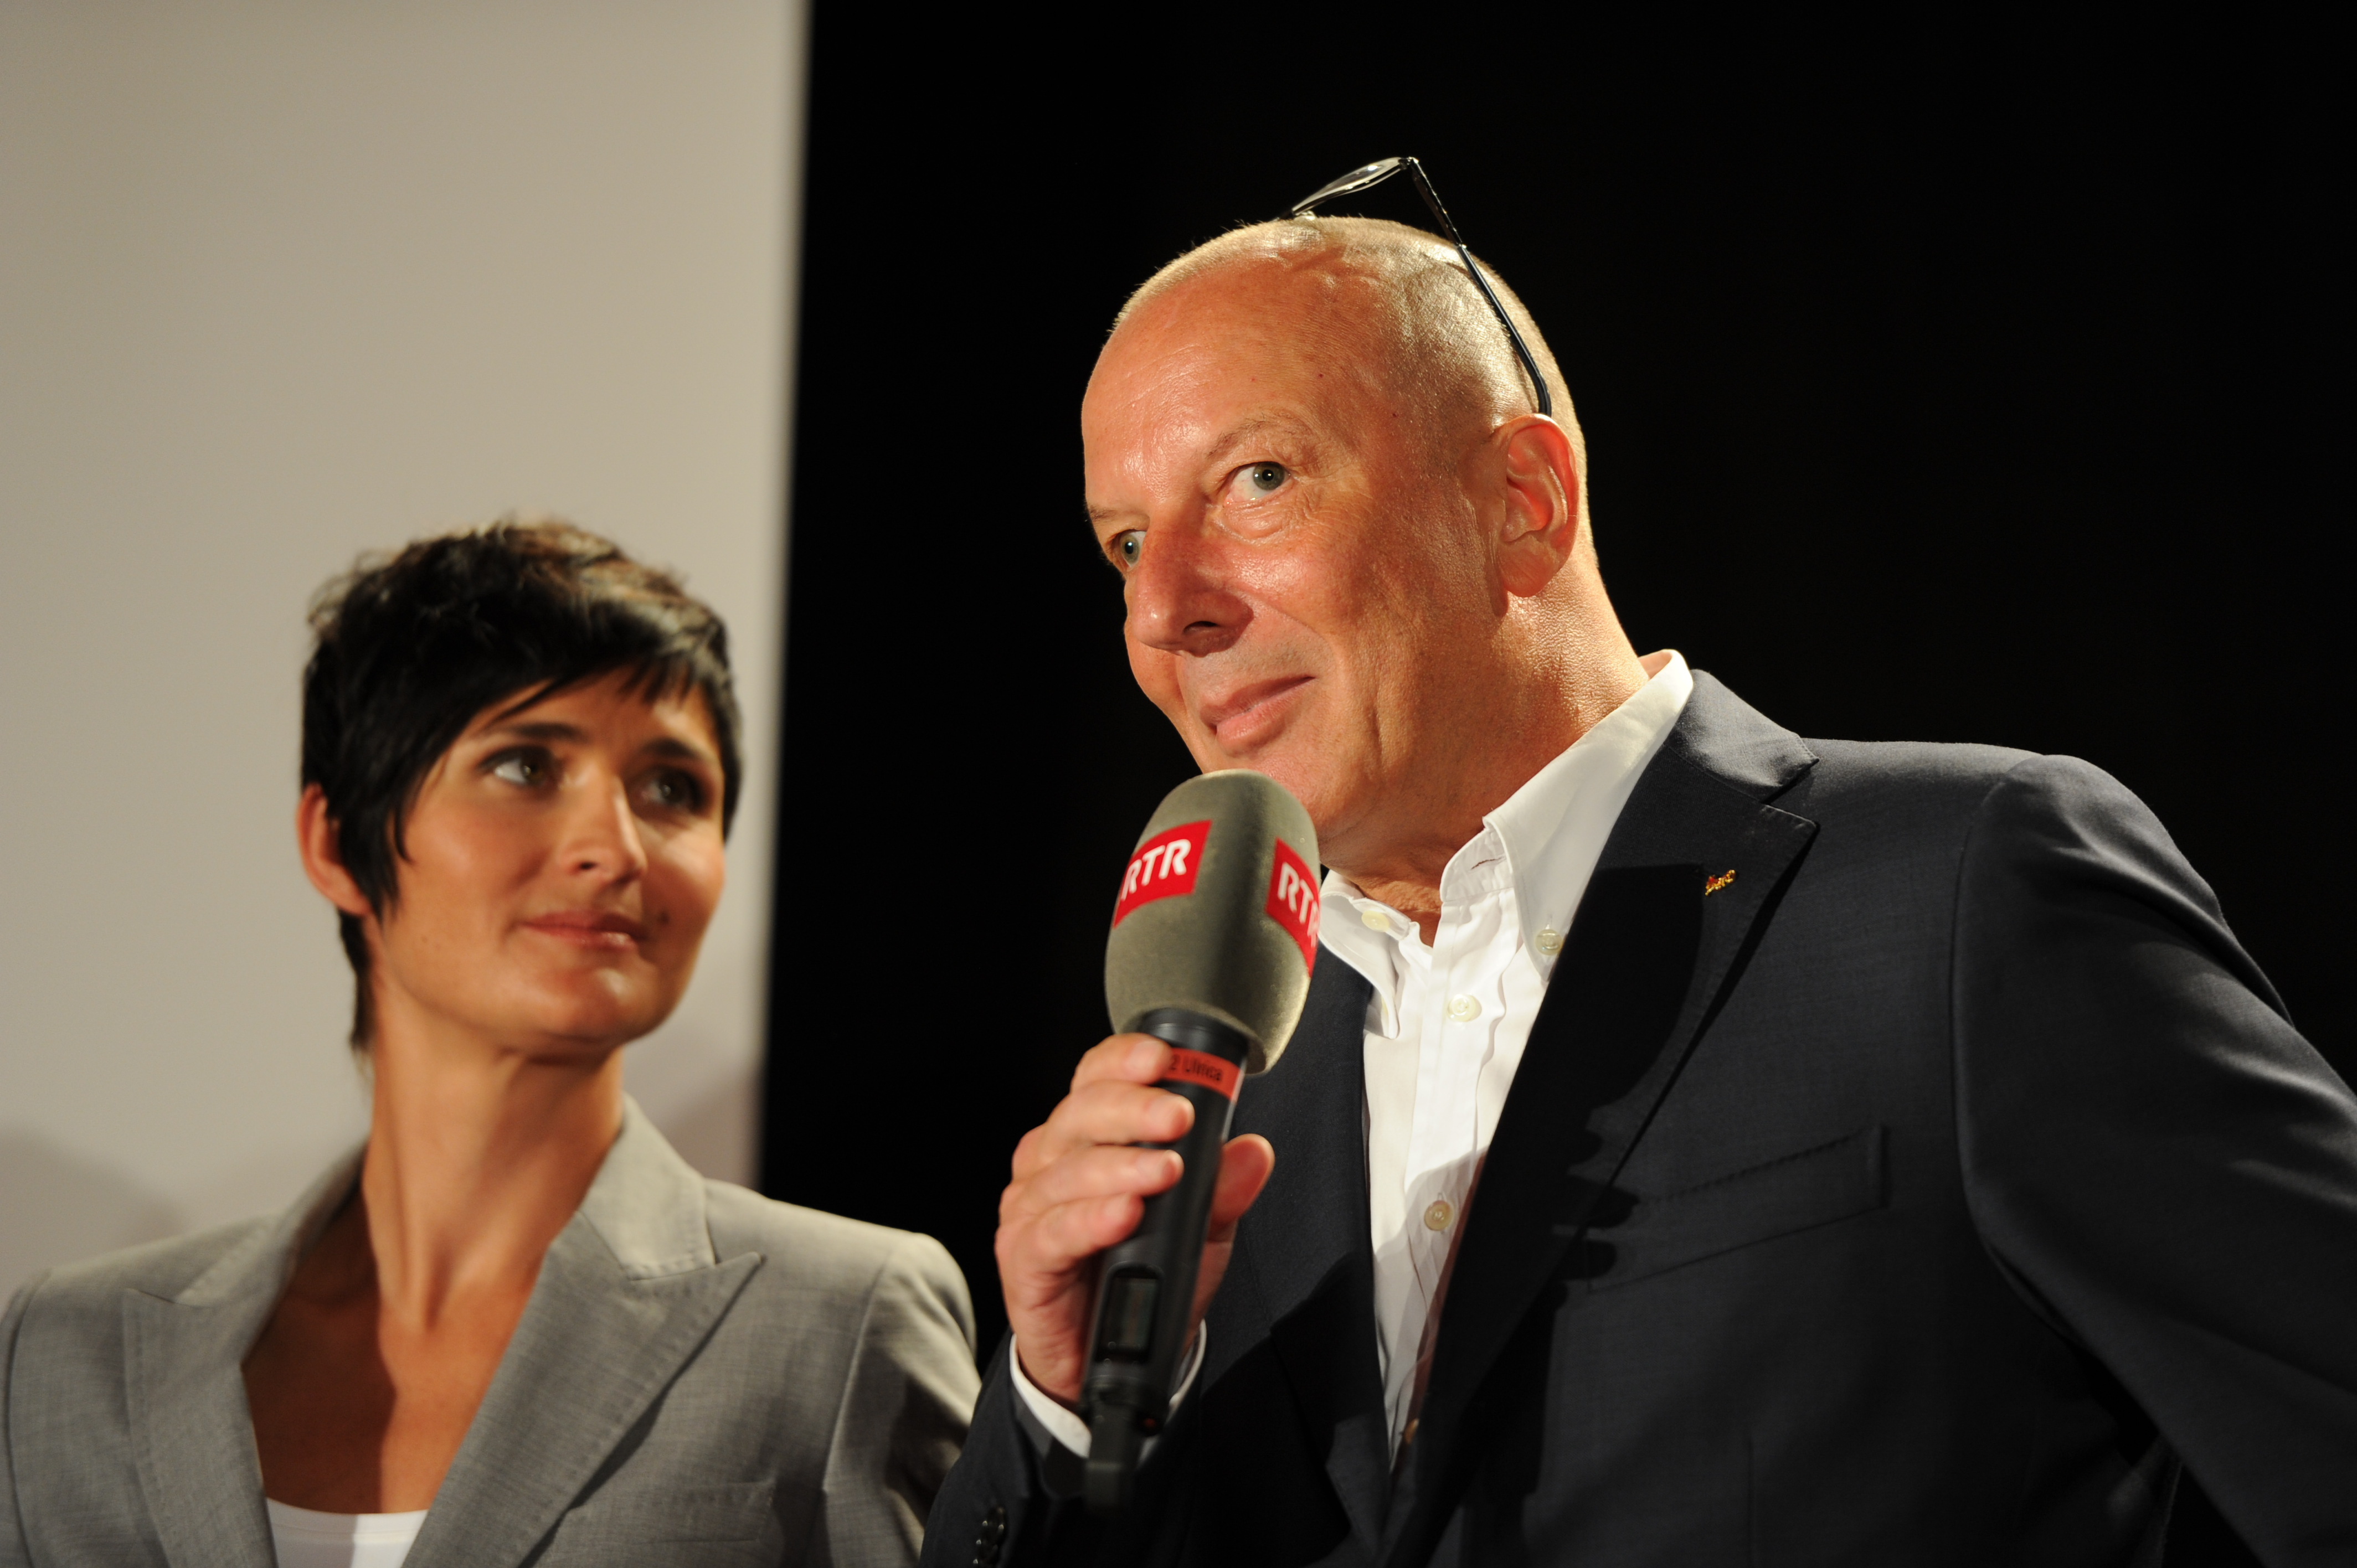 Era il directur general da la SRG SSR, Roger de Weck, porta ils auguris a la Televisiun Rumantscha.